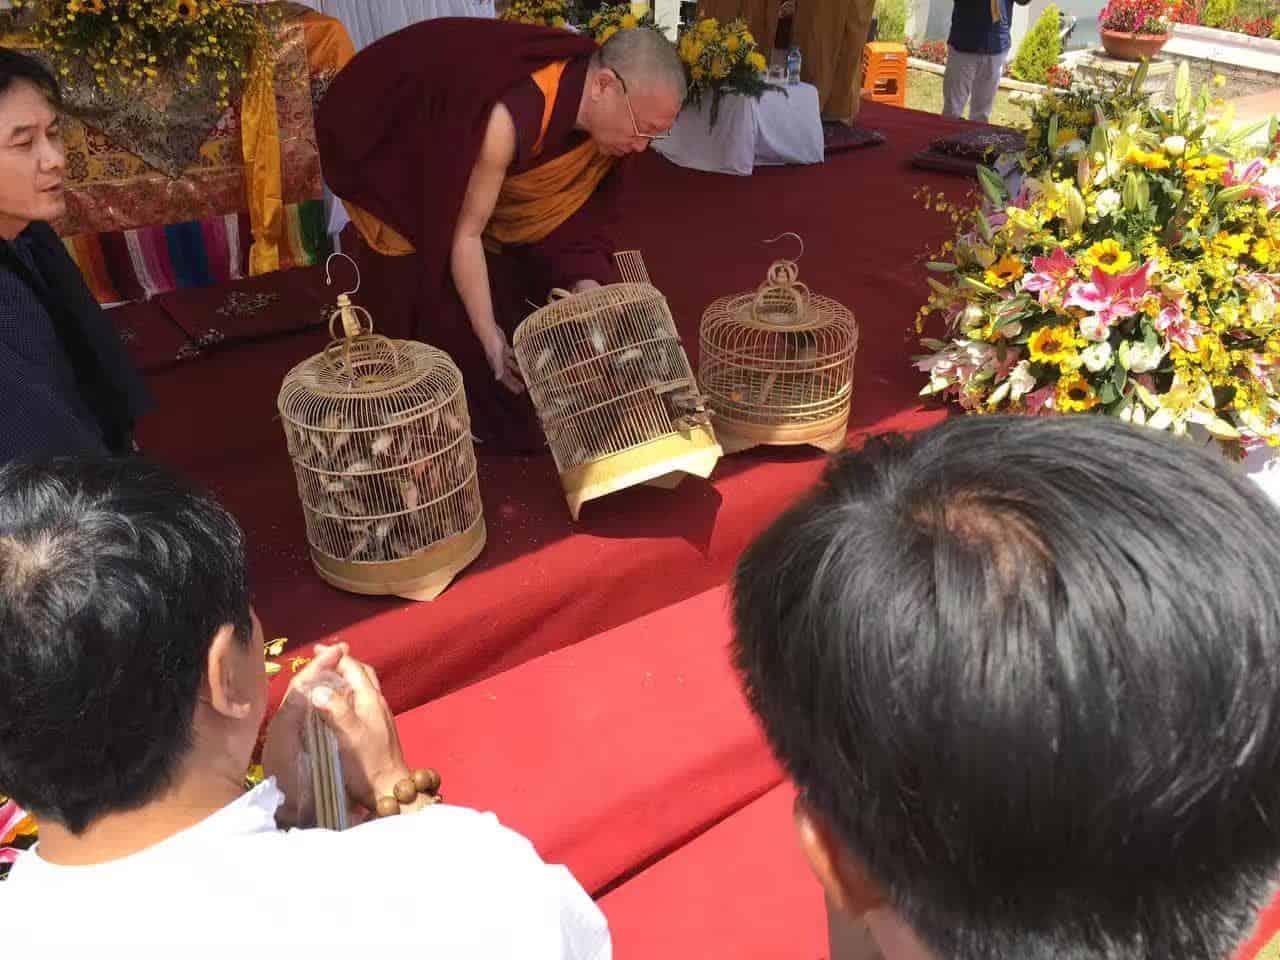 Gosok Rinpoche Vietnam 2017-03-05 884b1cfaa9655901776bab2c49b45e2